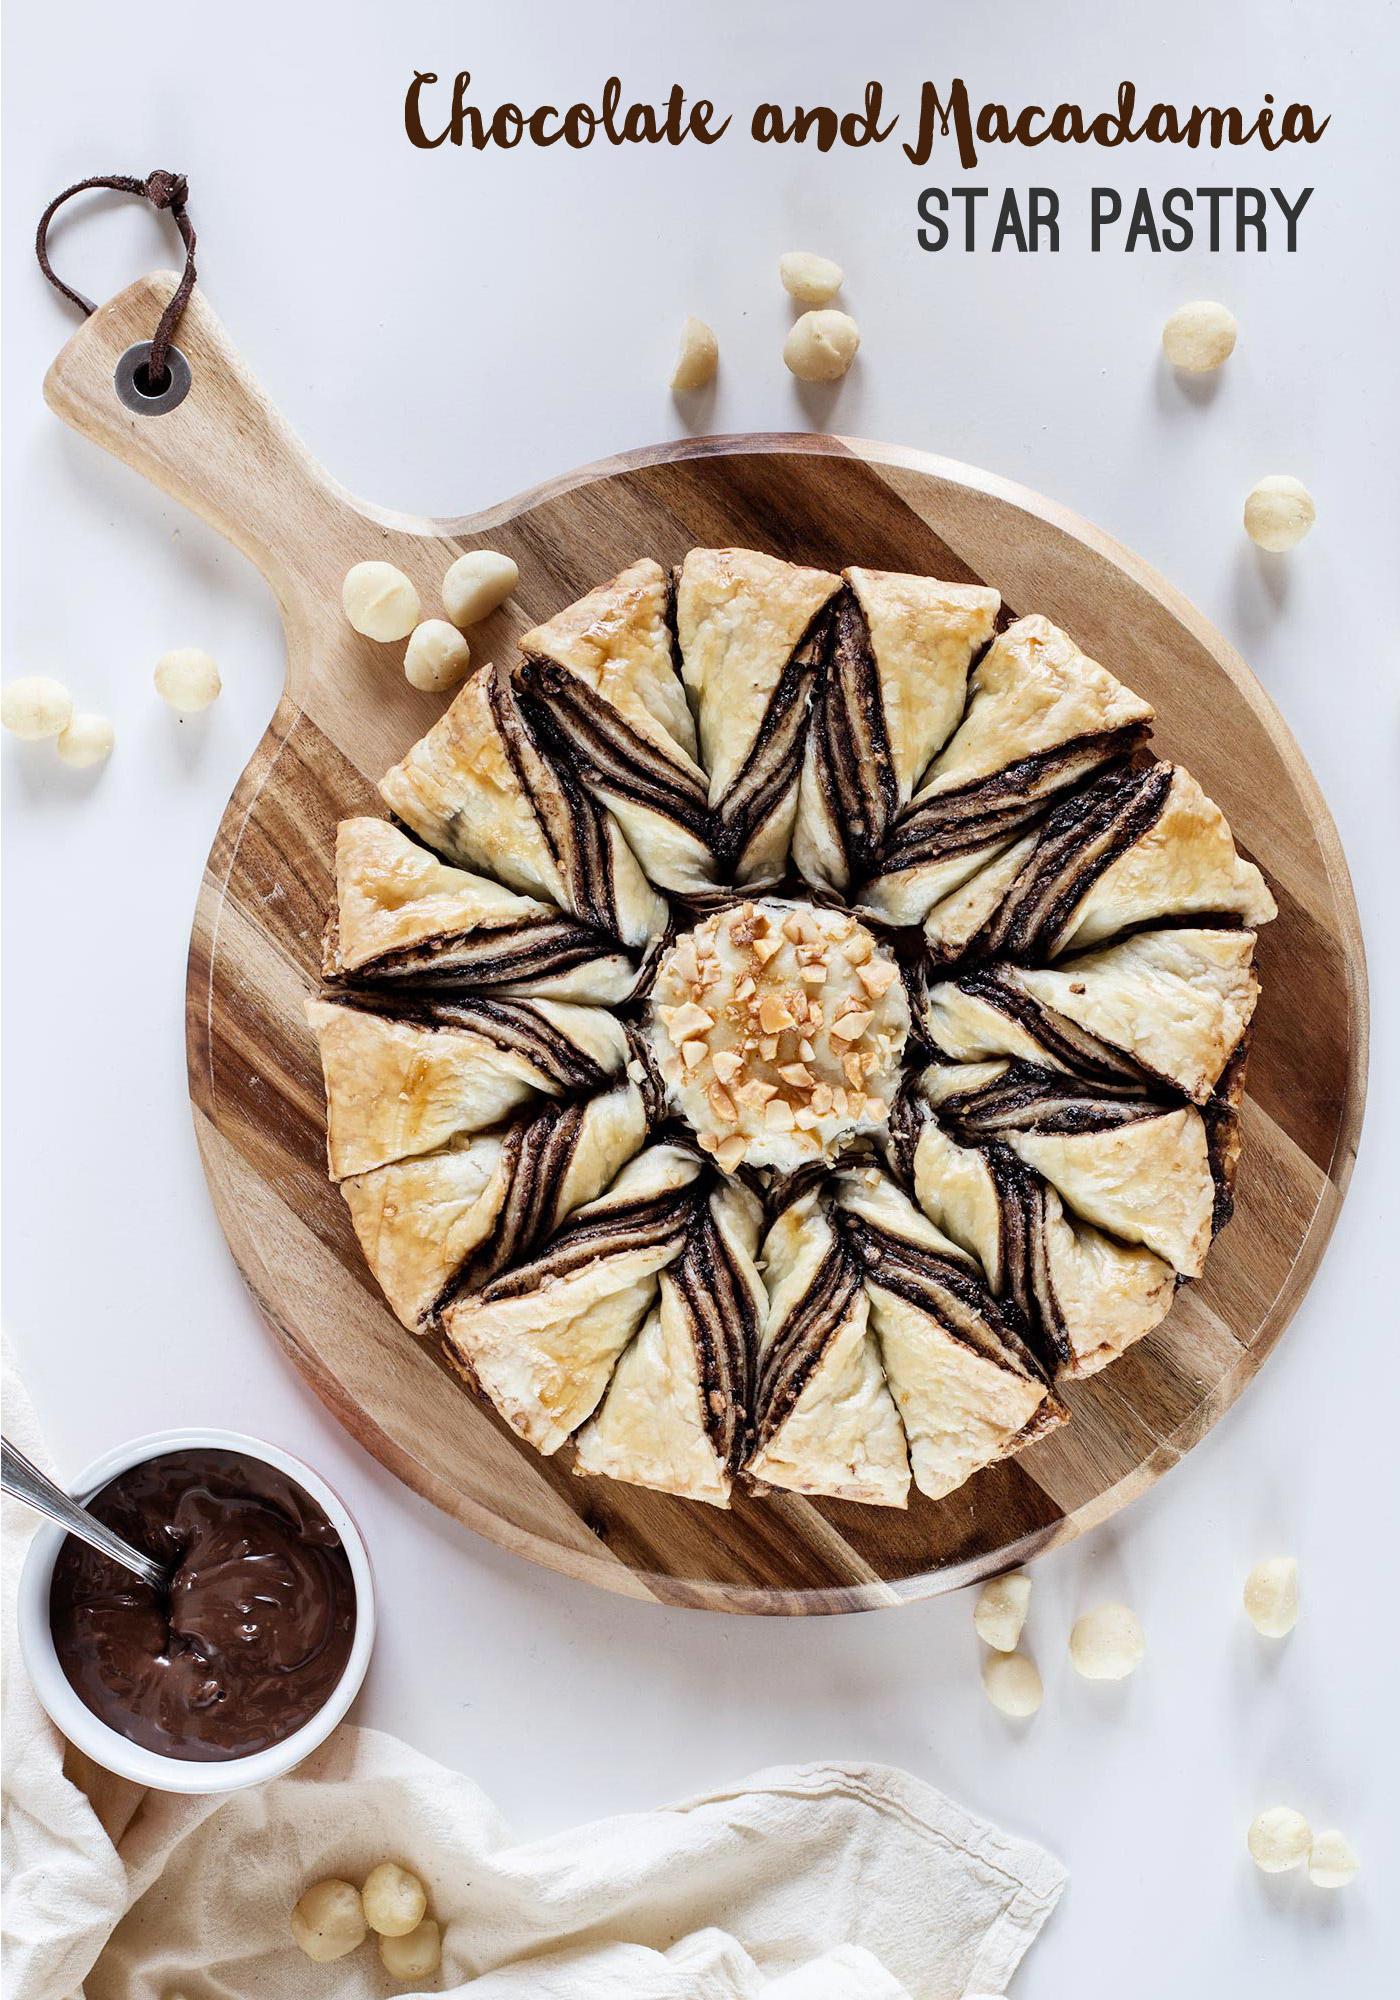 Chocolate and Macadamia Star Pastry